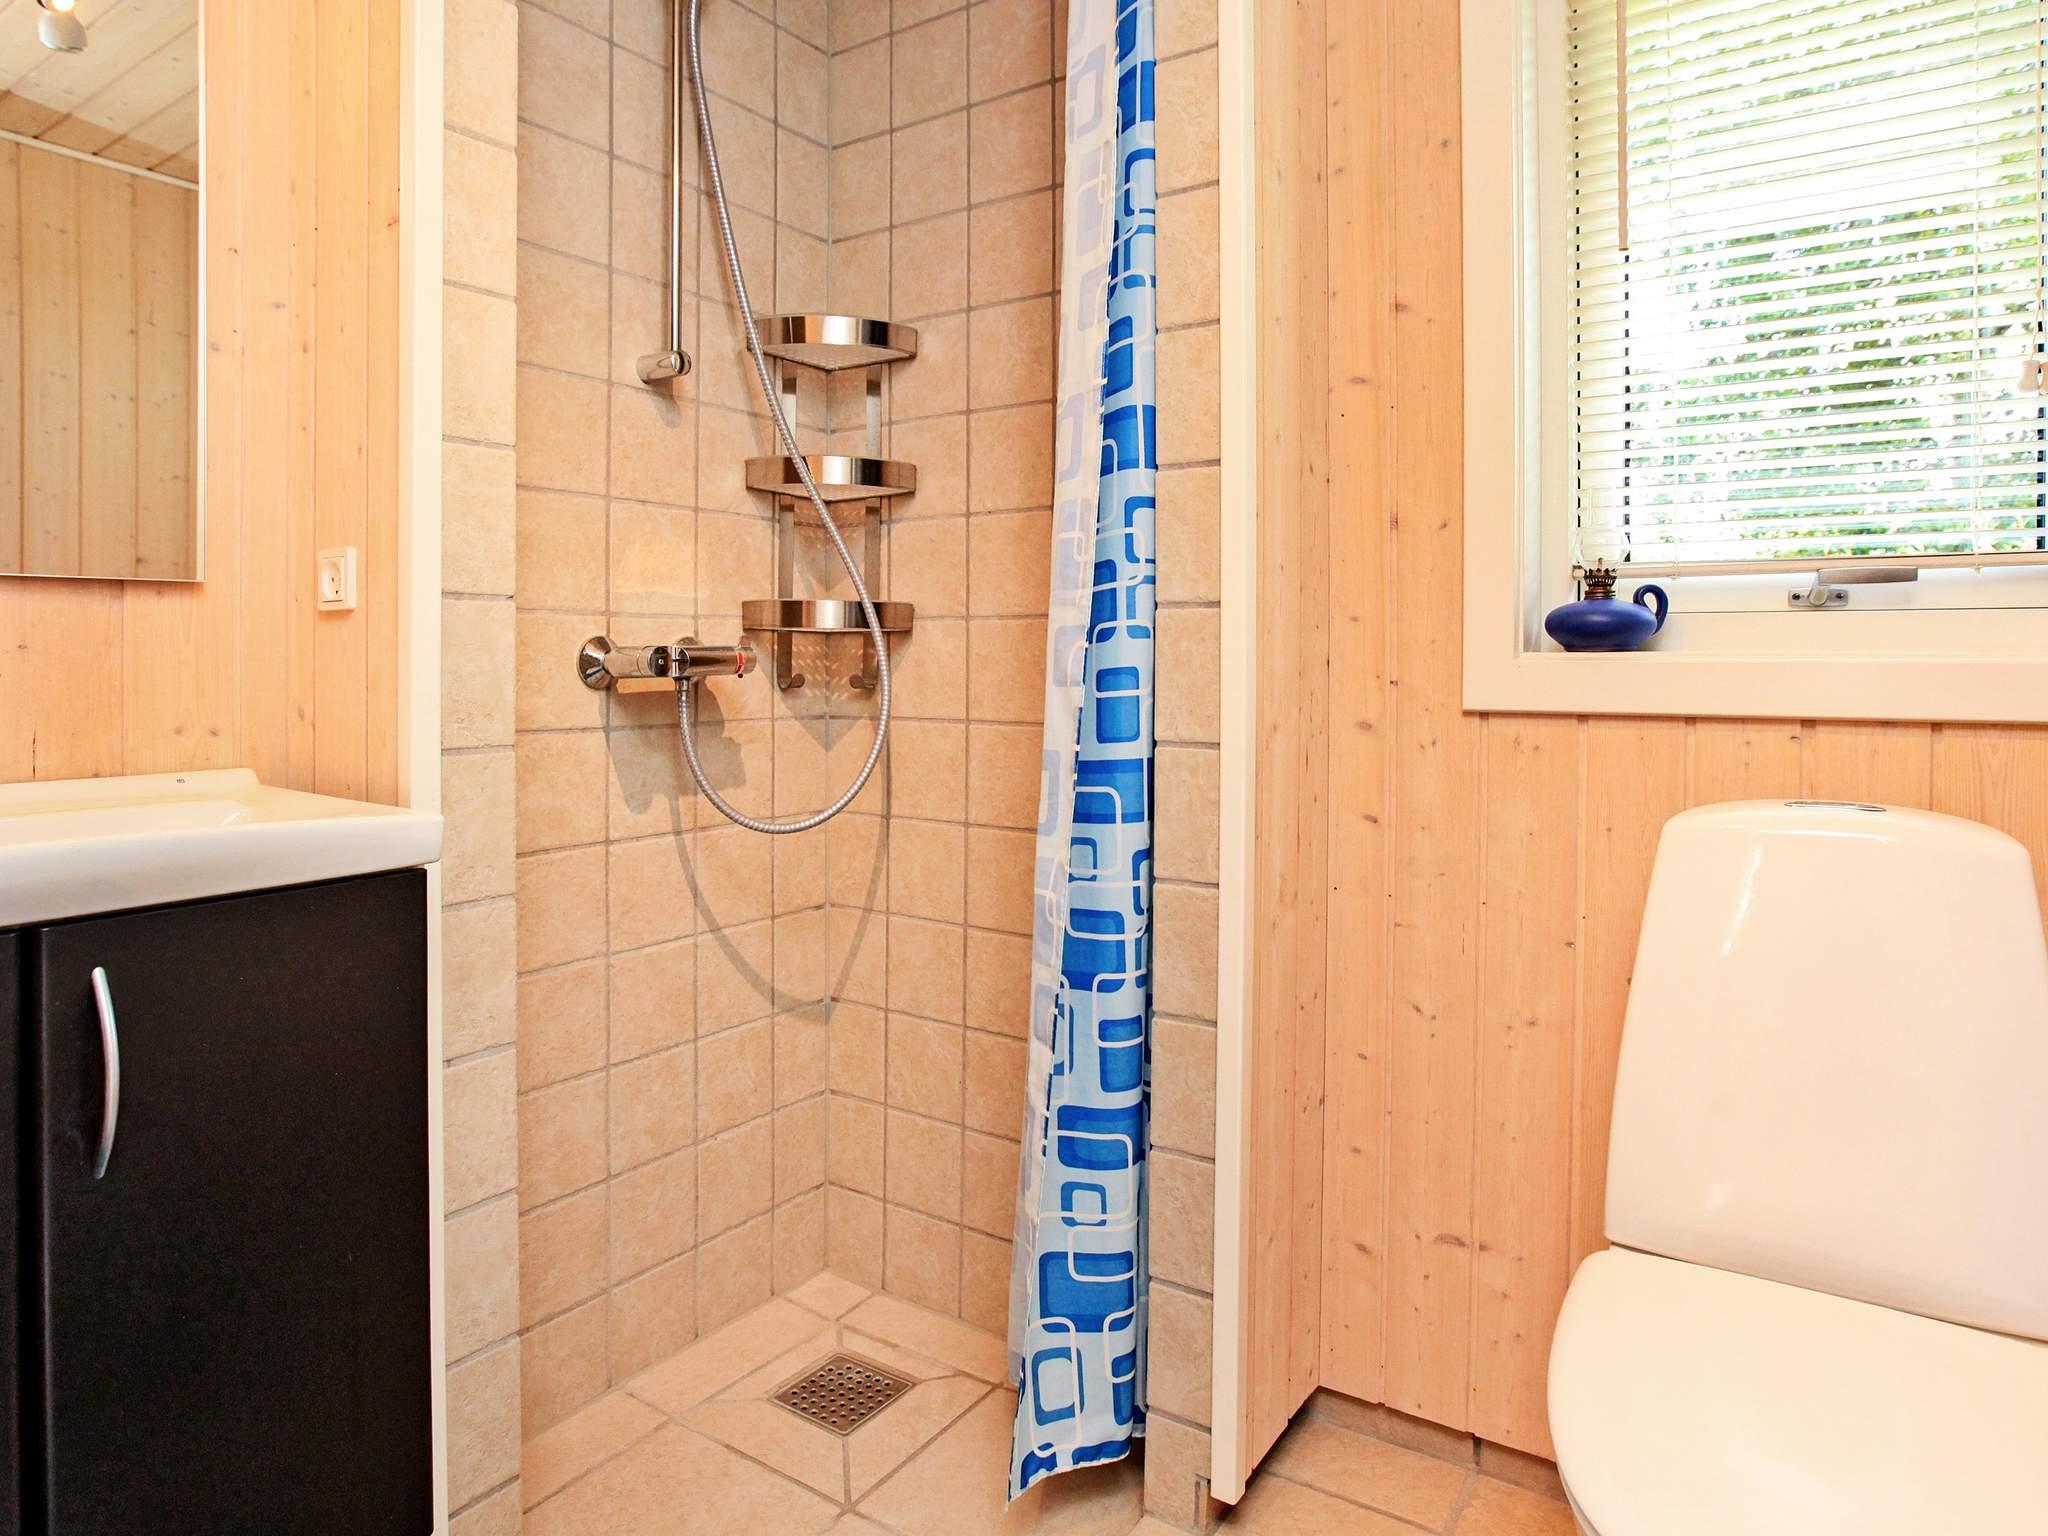 Ferienhaus Vejby Strand (681722), Vejby, , Nordseeland, Dänemark, Bild 12